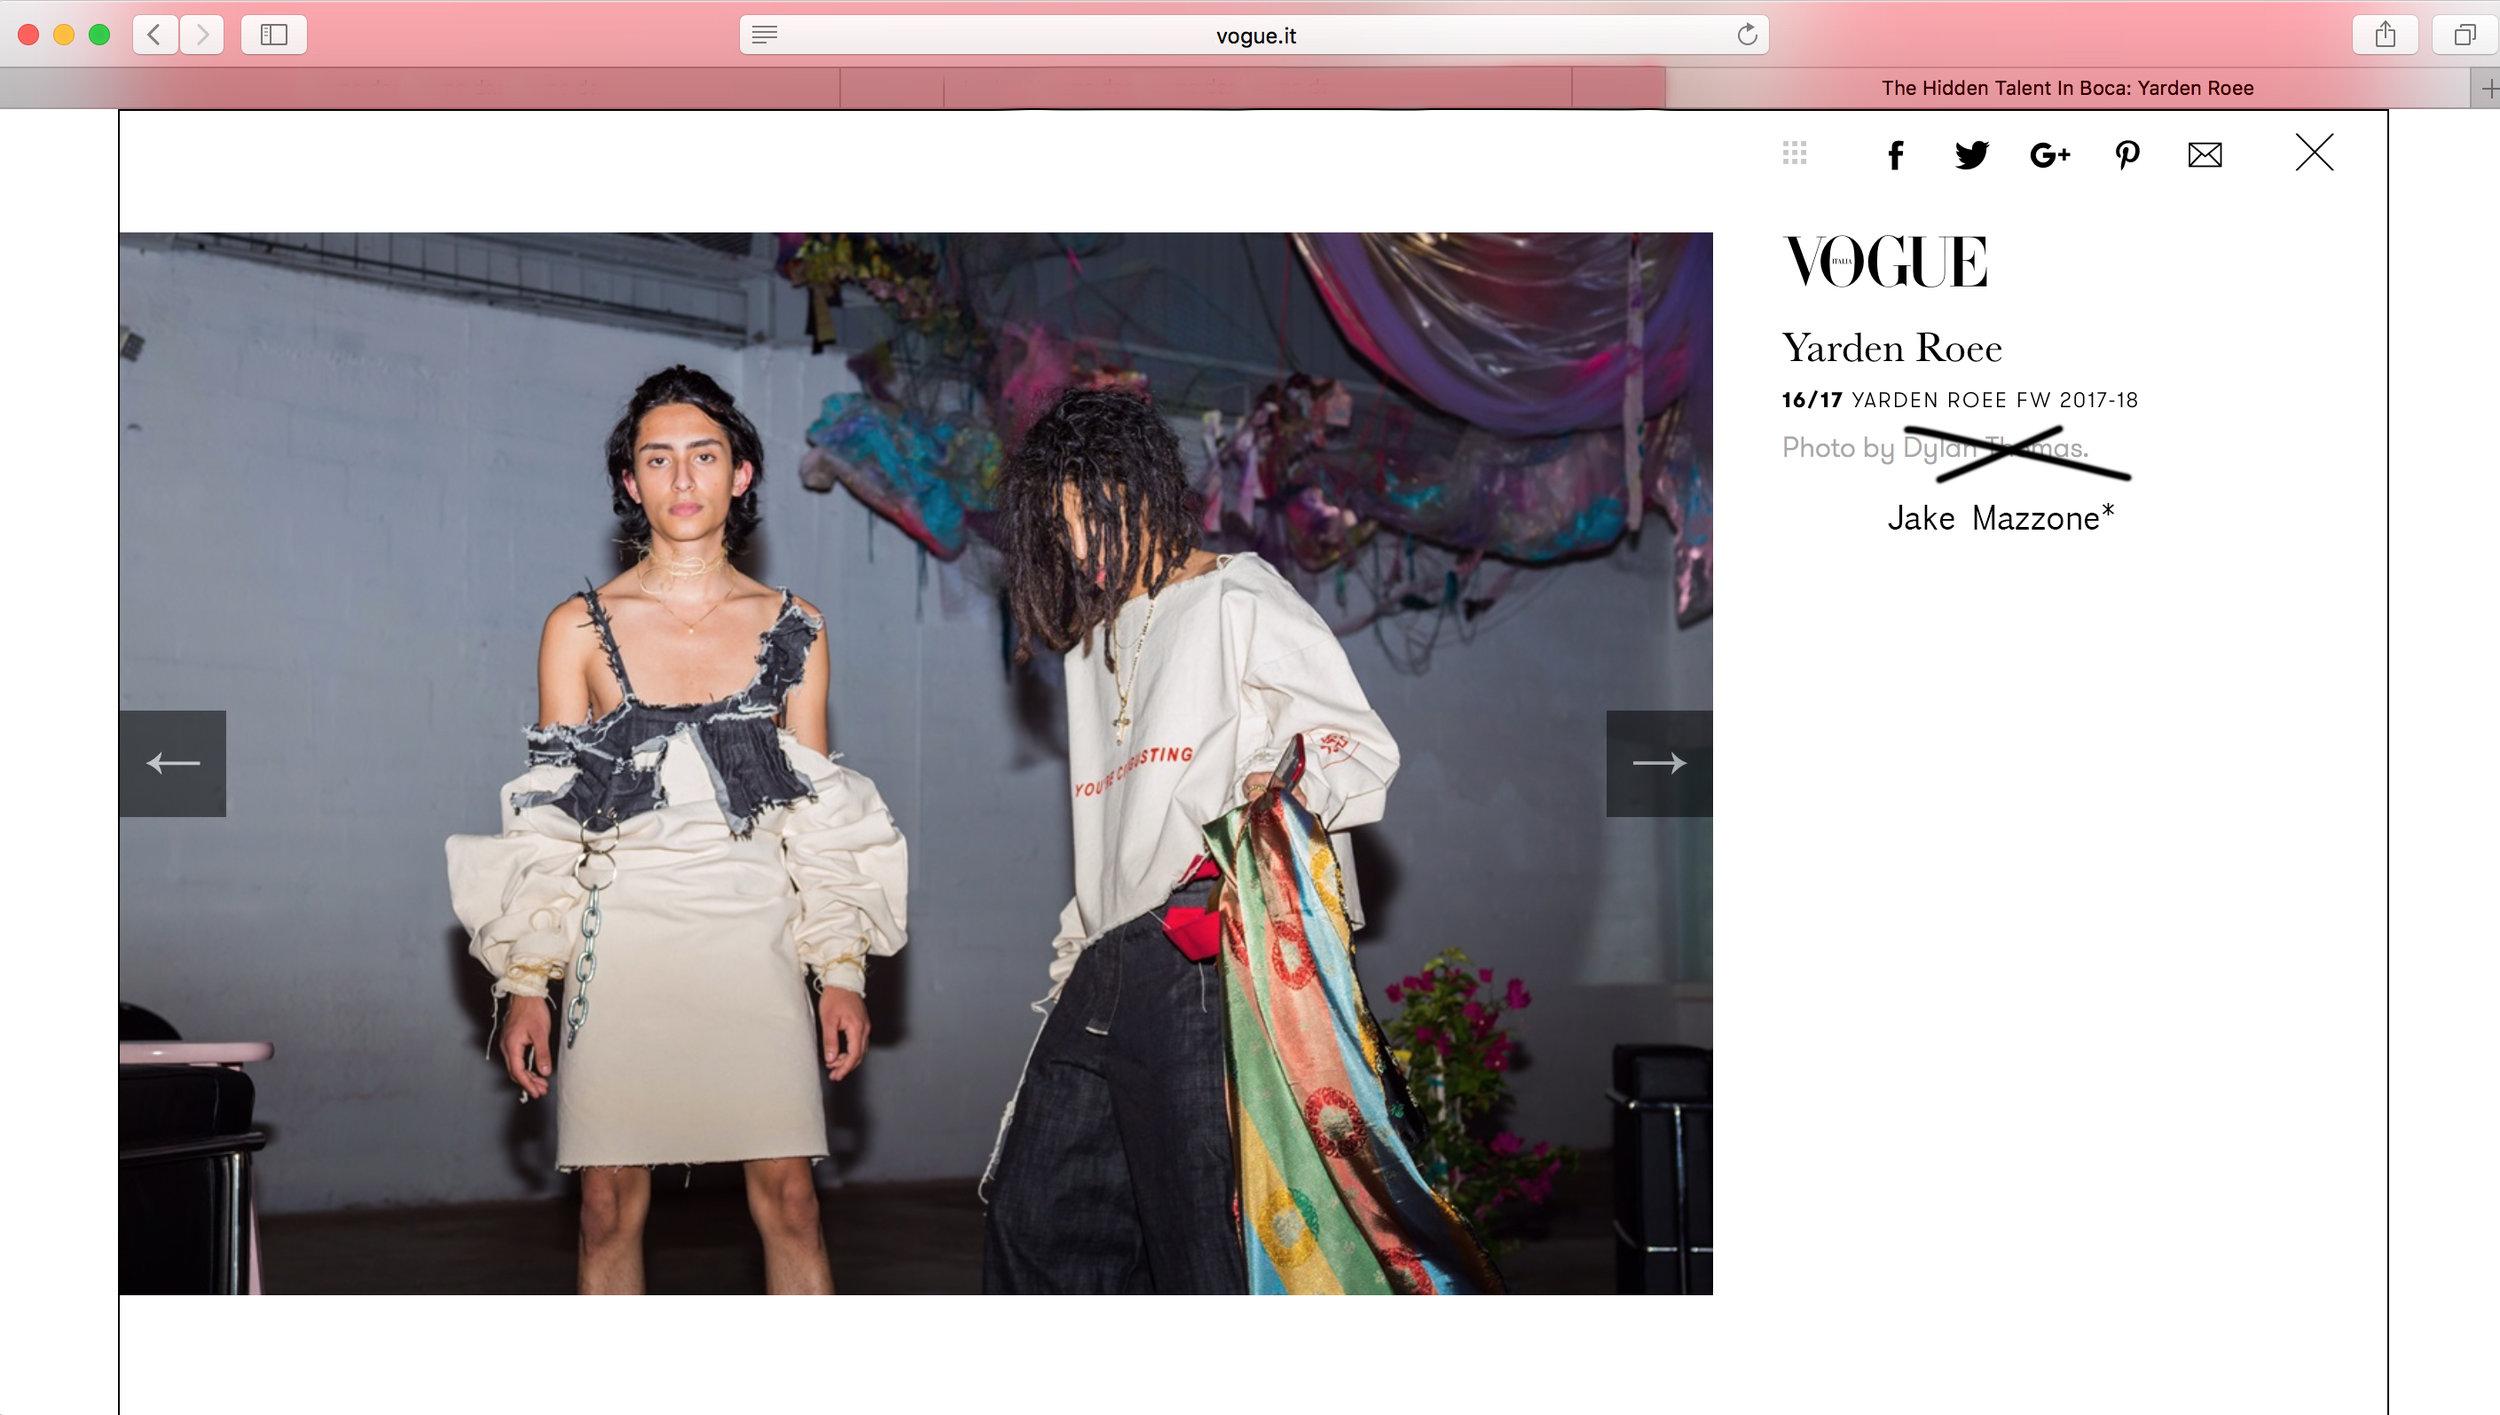 Vogue Italia Jake Mazzone